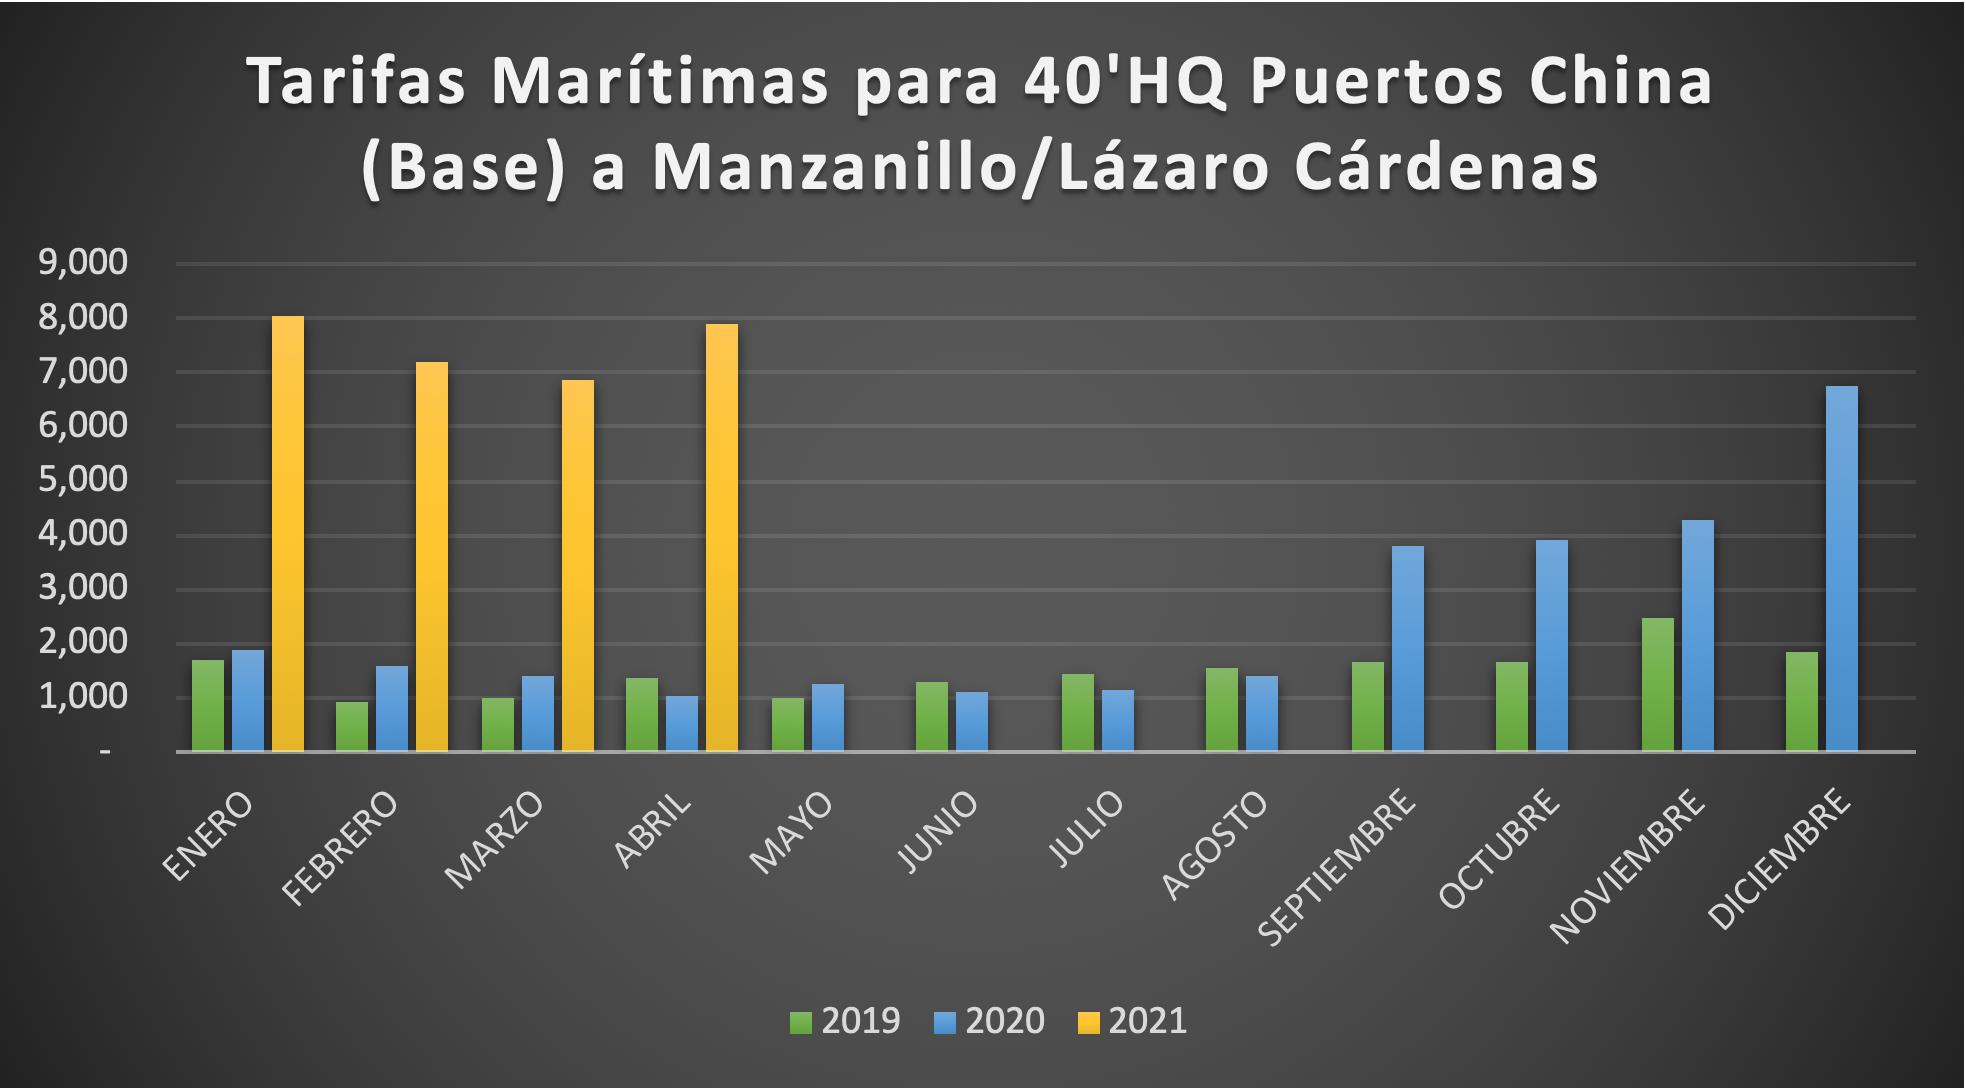 Tarifas marítimas de contenedores HQ de 40